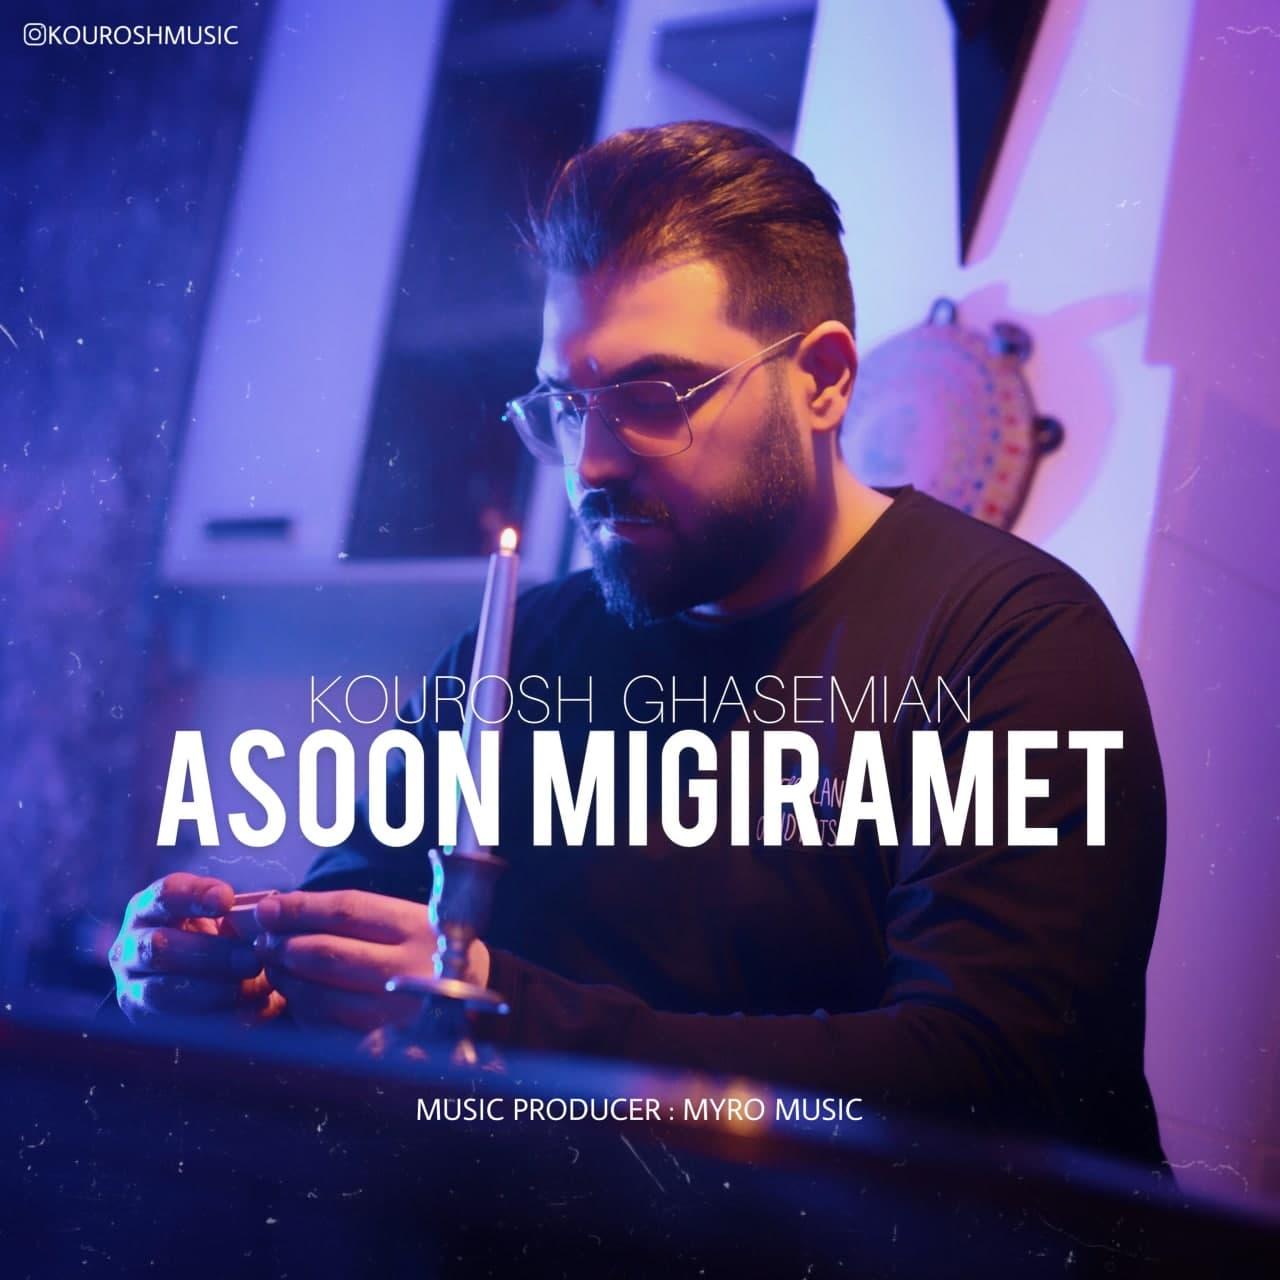 Kourosh Ghasemian – Asoon Migiramet